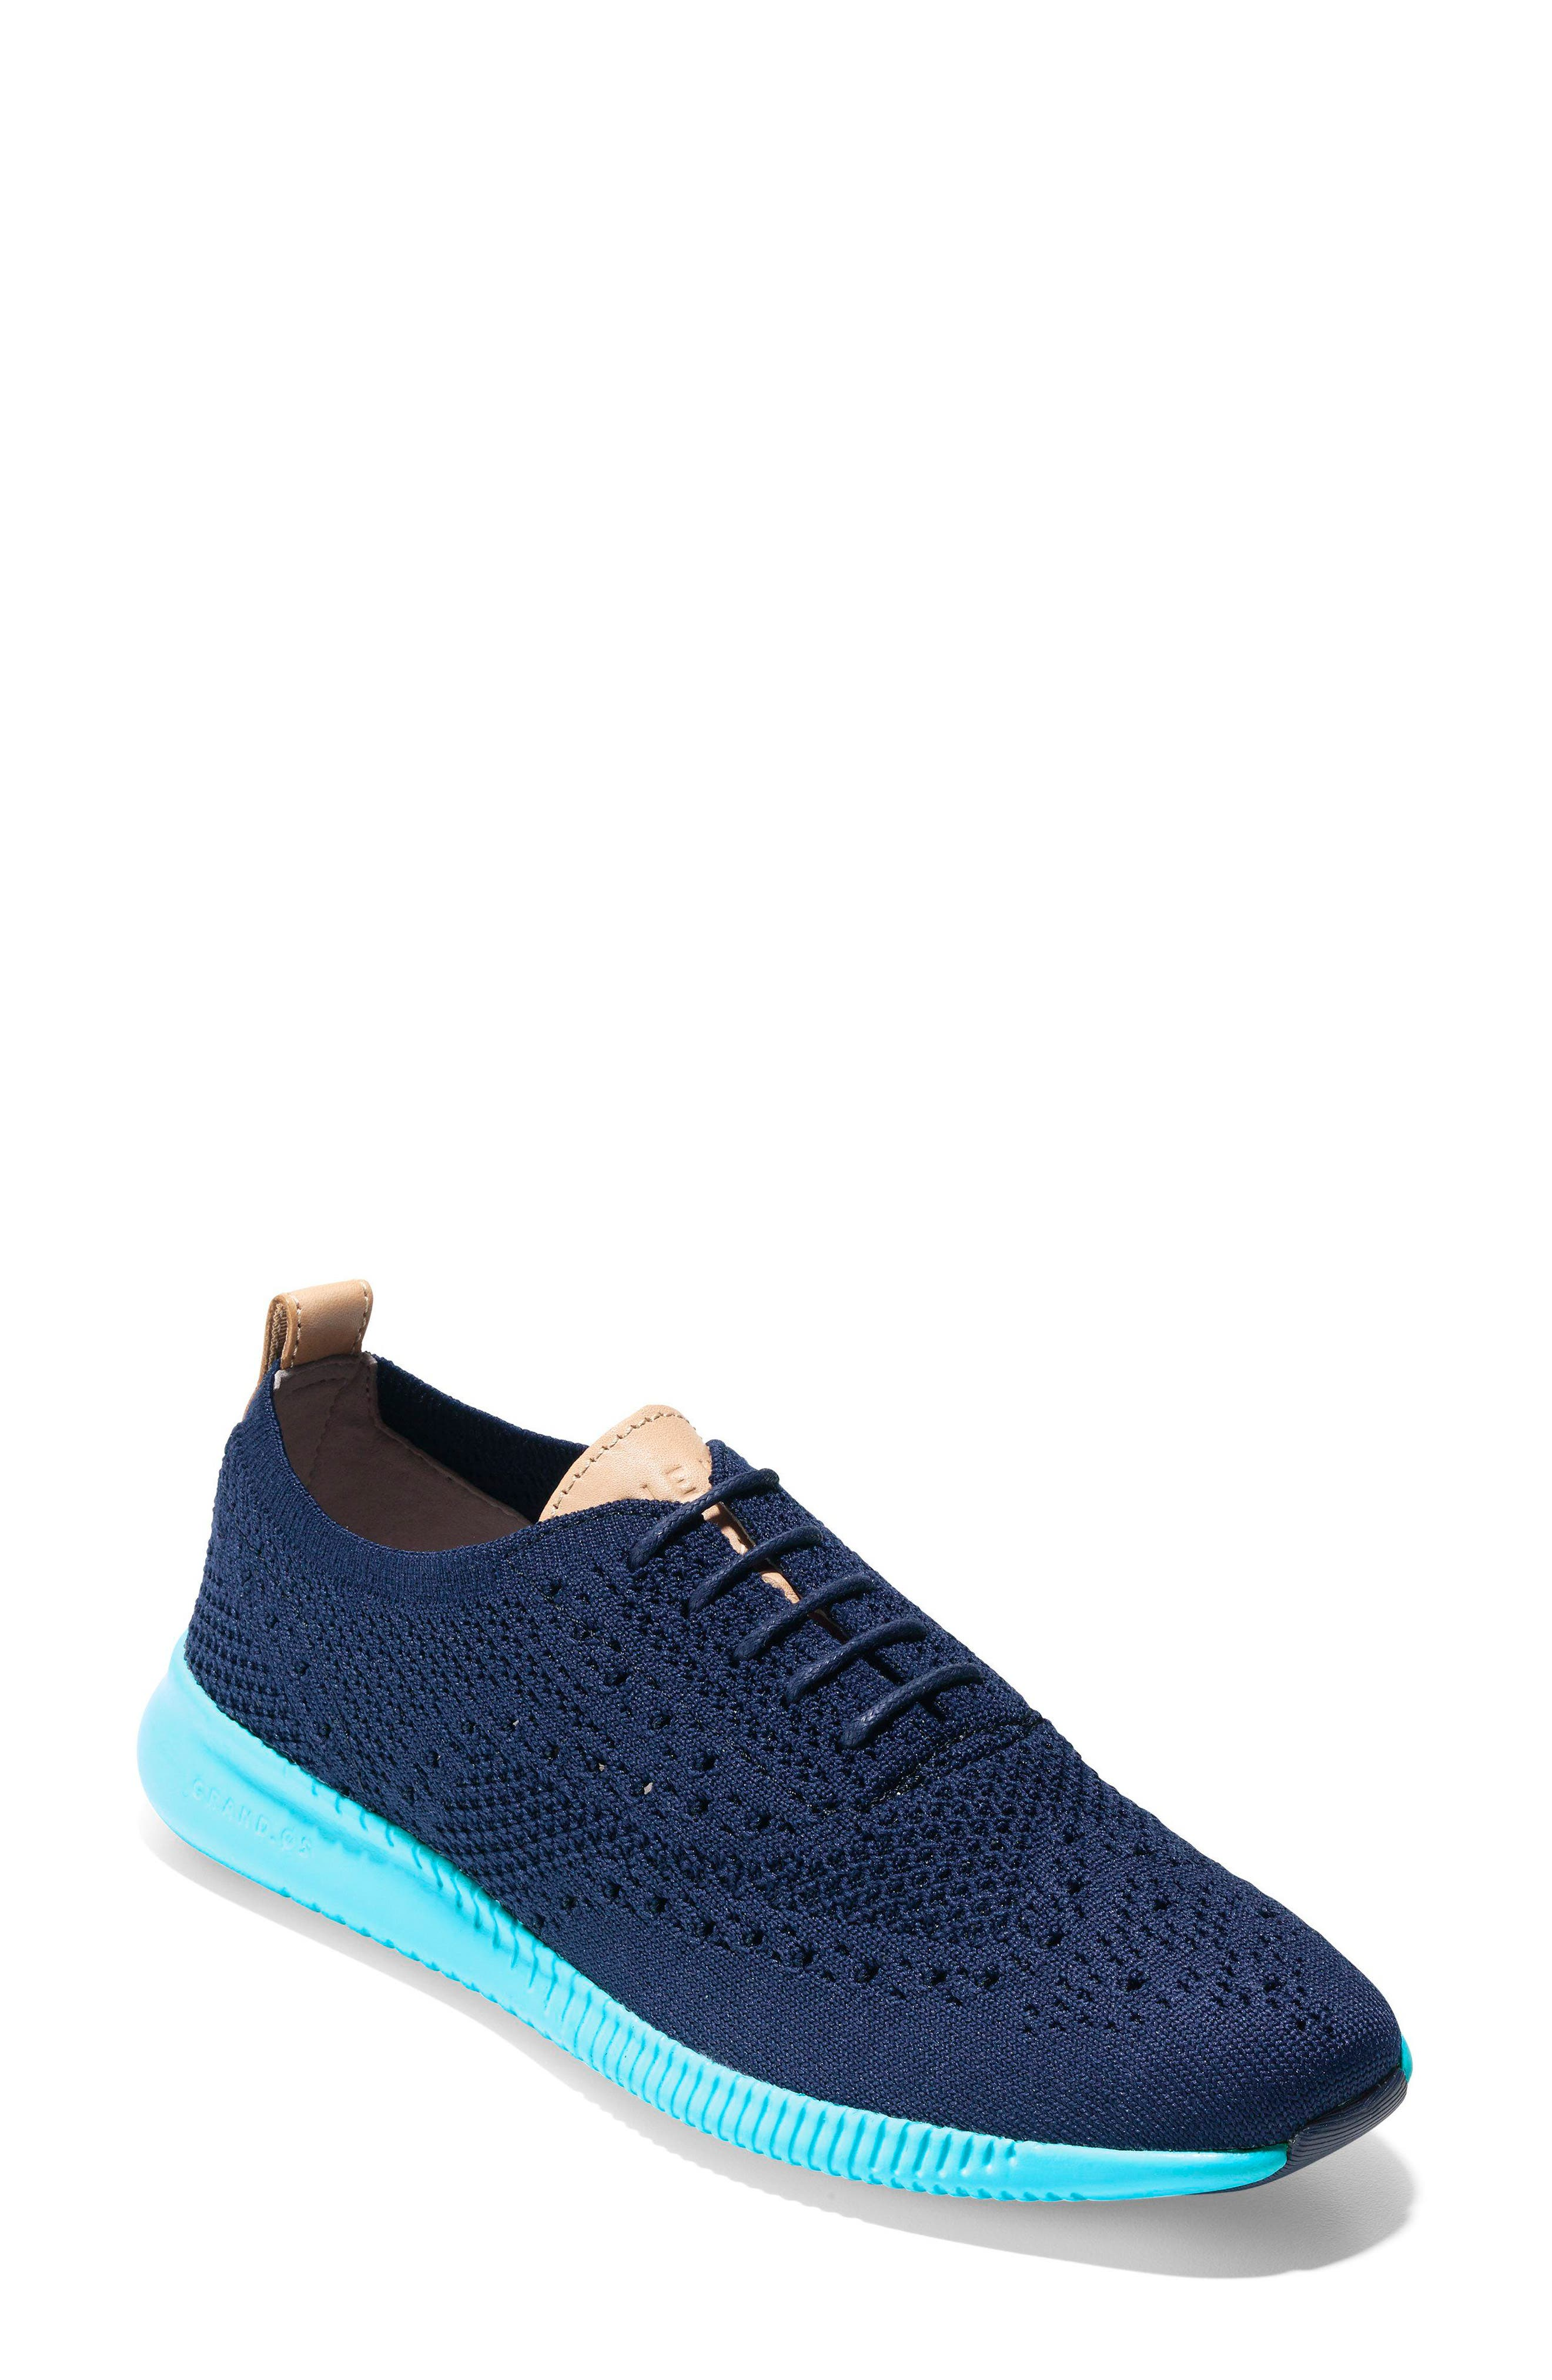 2.ZERØGRAND Stitchlite Wingtip Sneaker,                         Main,                         color, MARINE BLUE/ BLUEFISH FABRIC